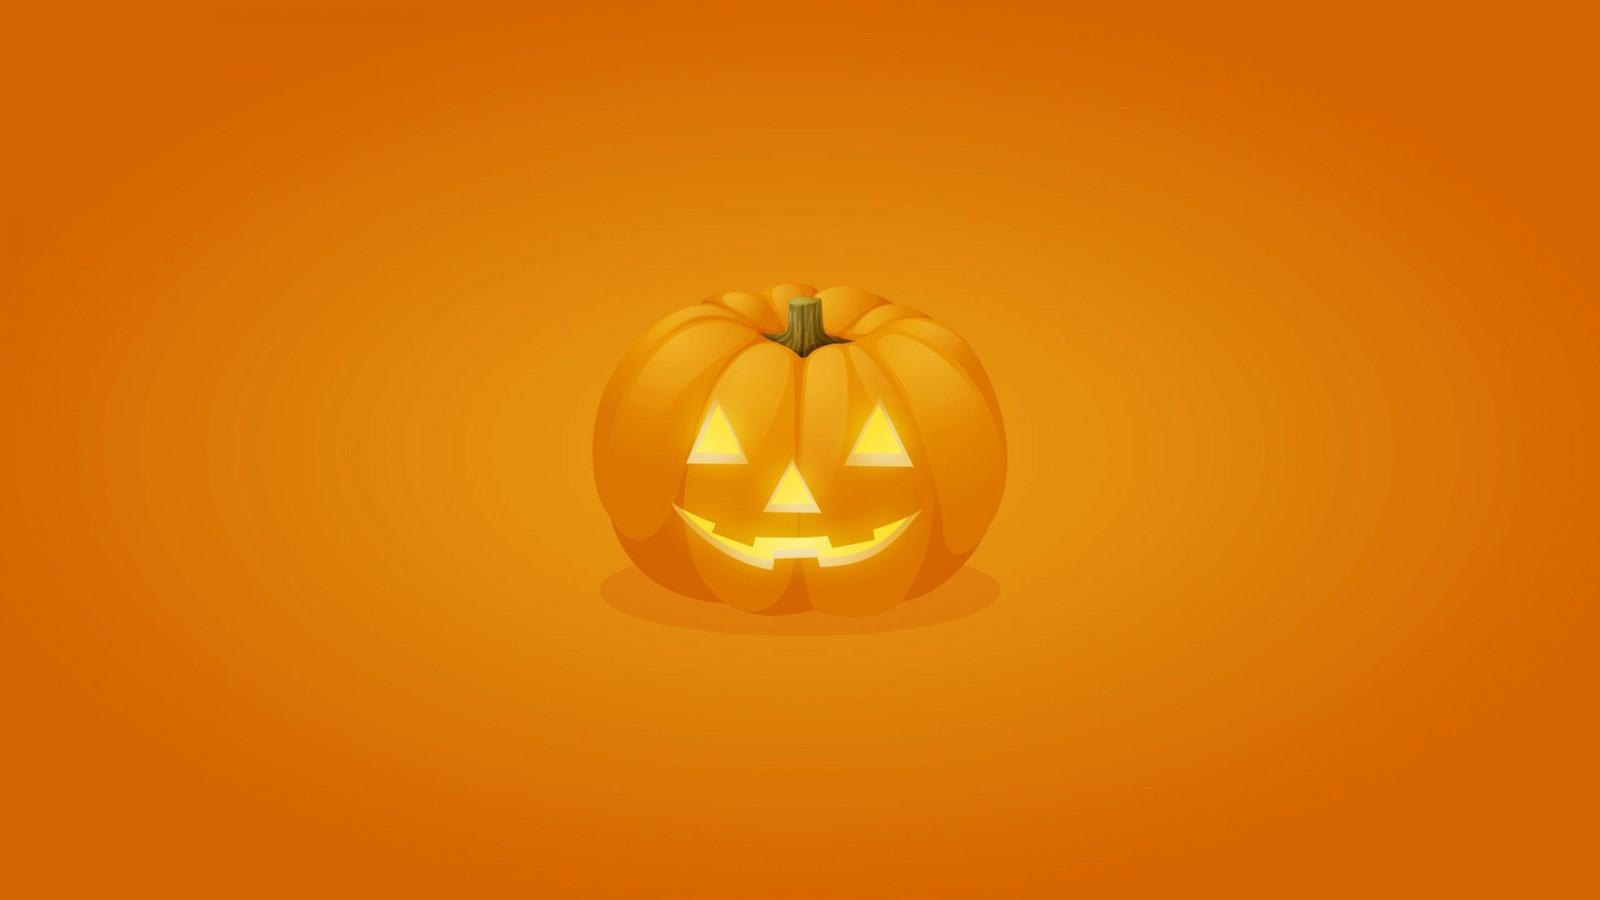 Happy Holi 3d Wallpapers Halloween Pumpkin Wallpapers Hd Wallpapers Id 9056